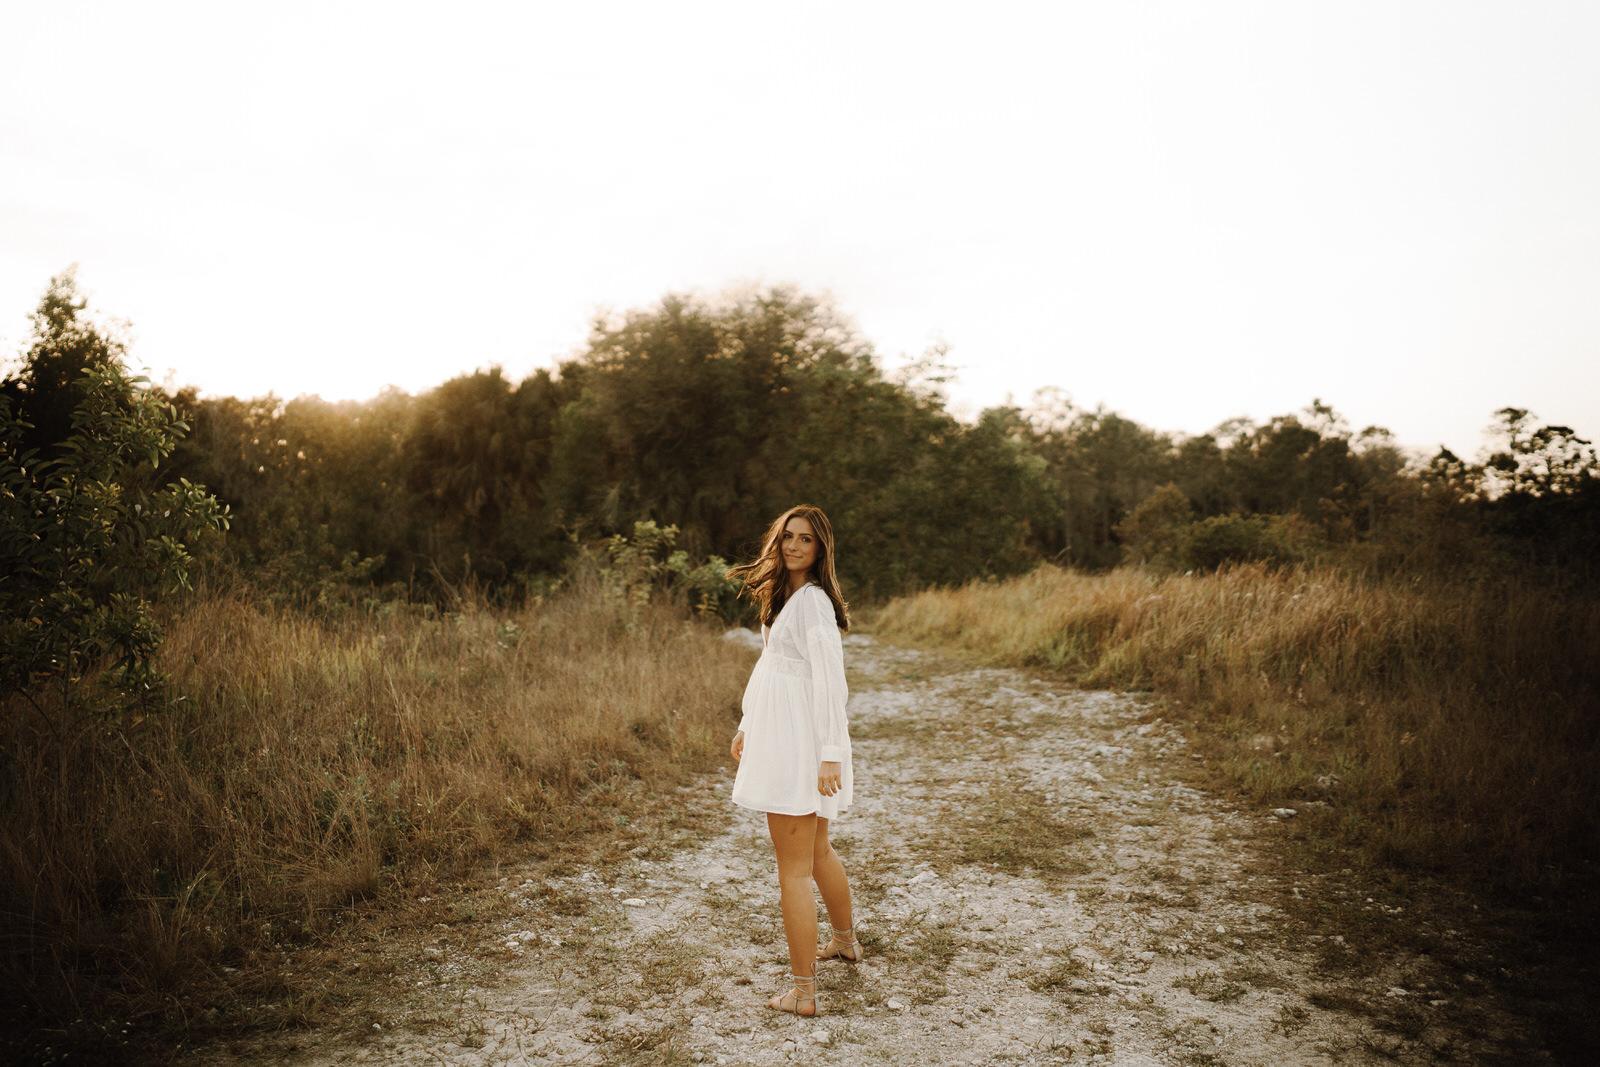 Fort Myers Senior Photos- Michelle Gonzalez Photography- Kate McQuagge-111.JPG